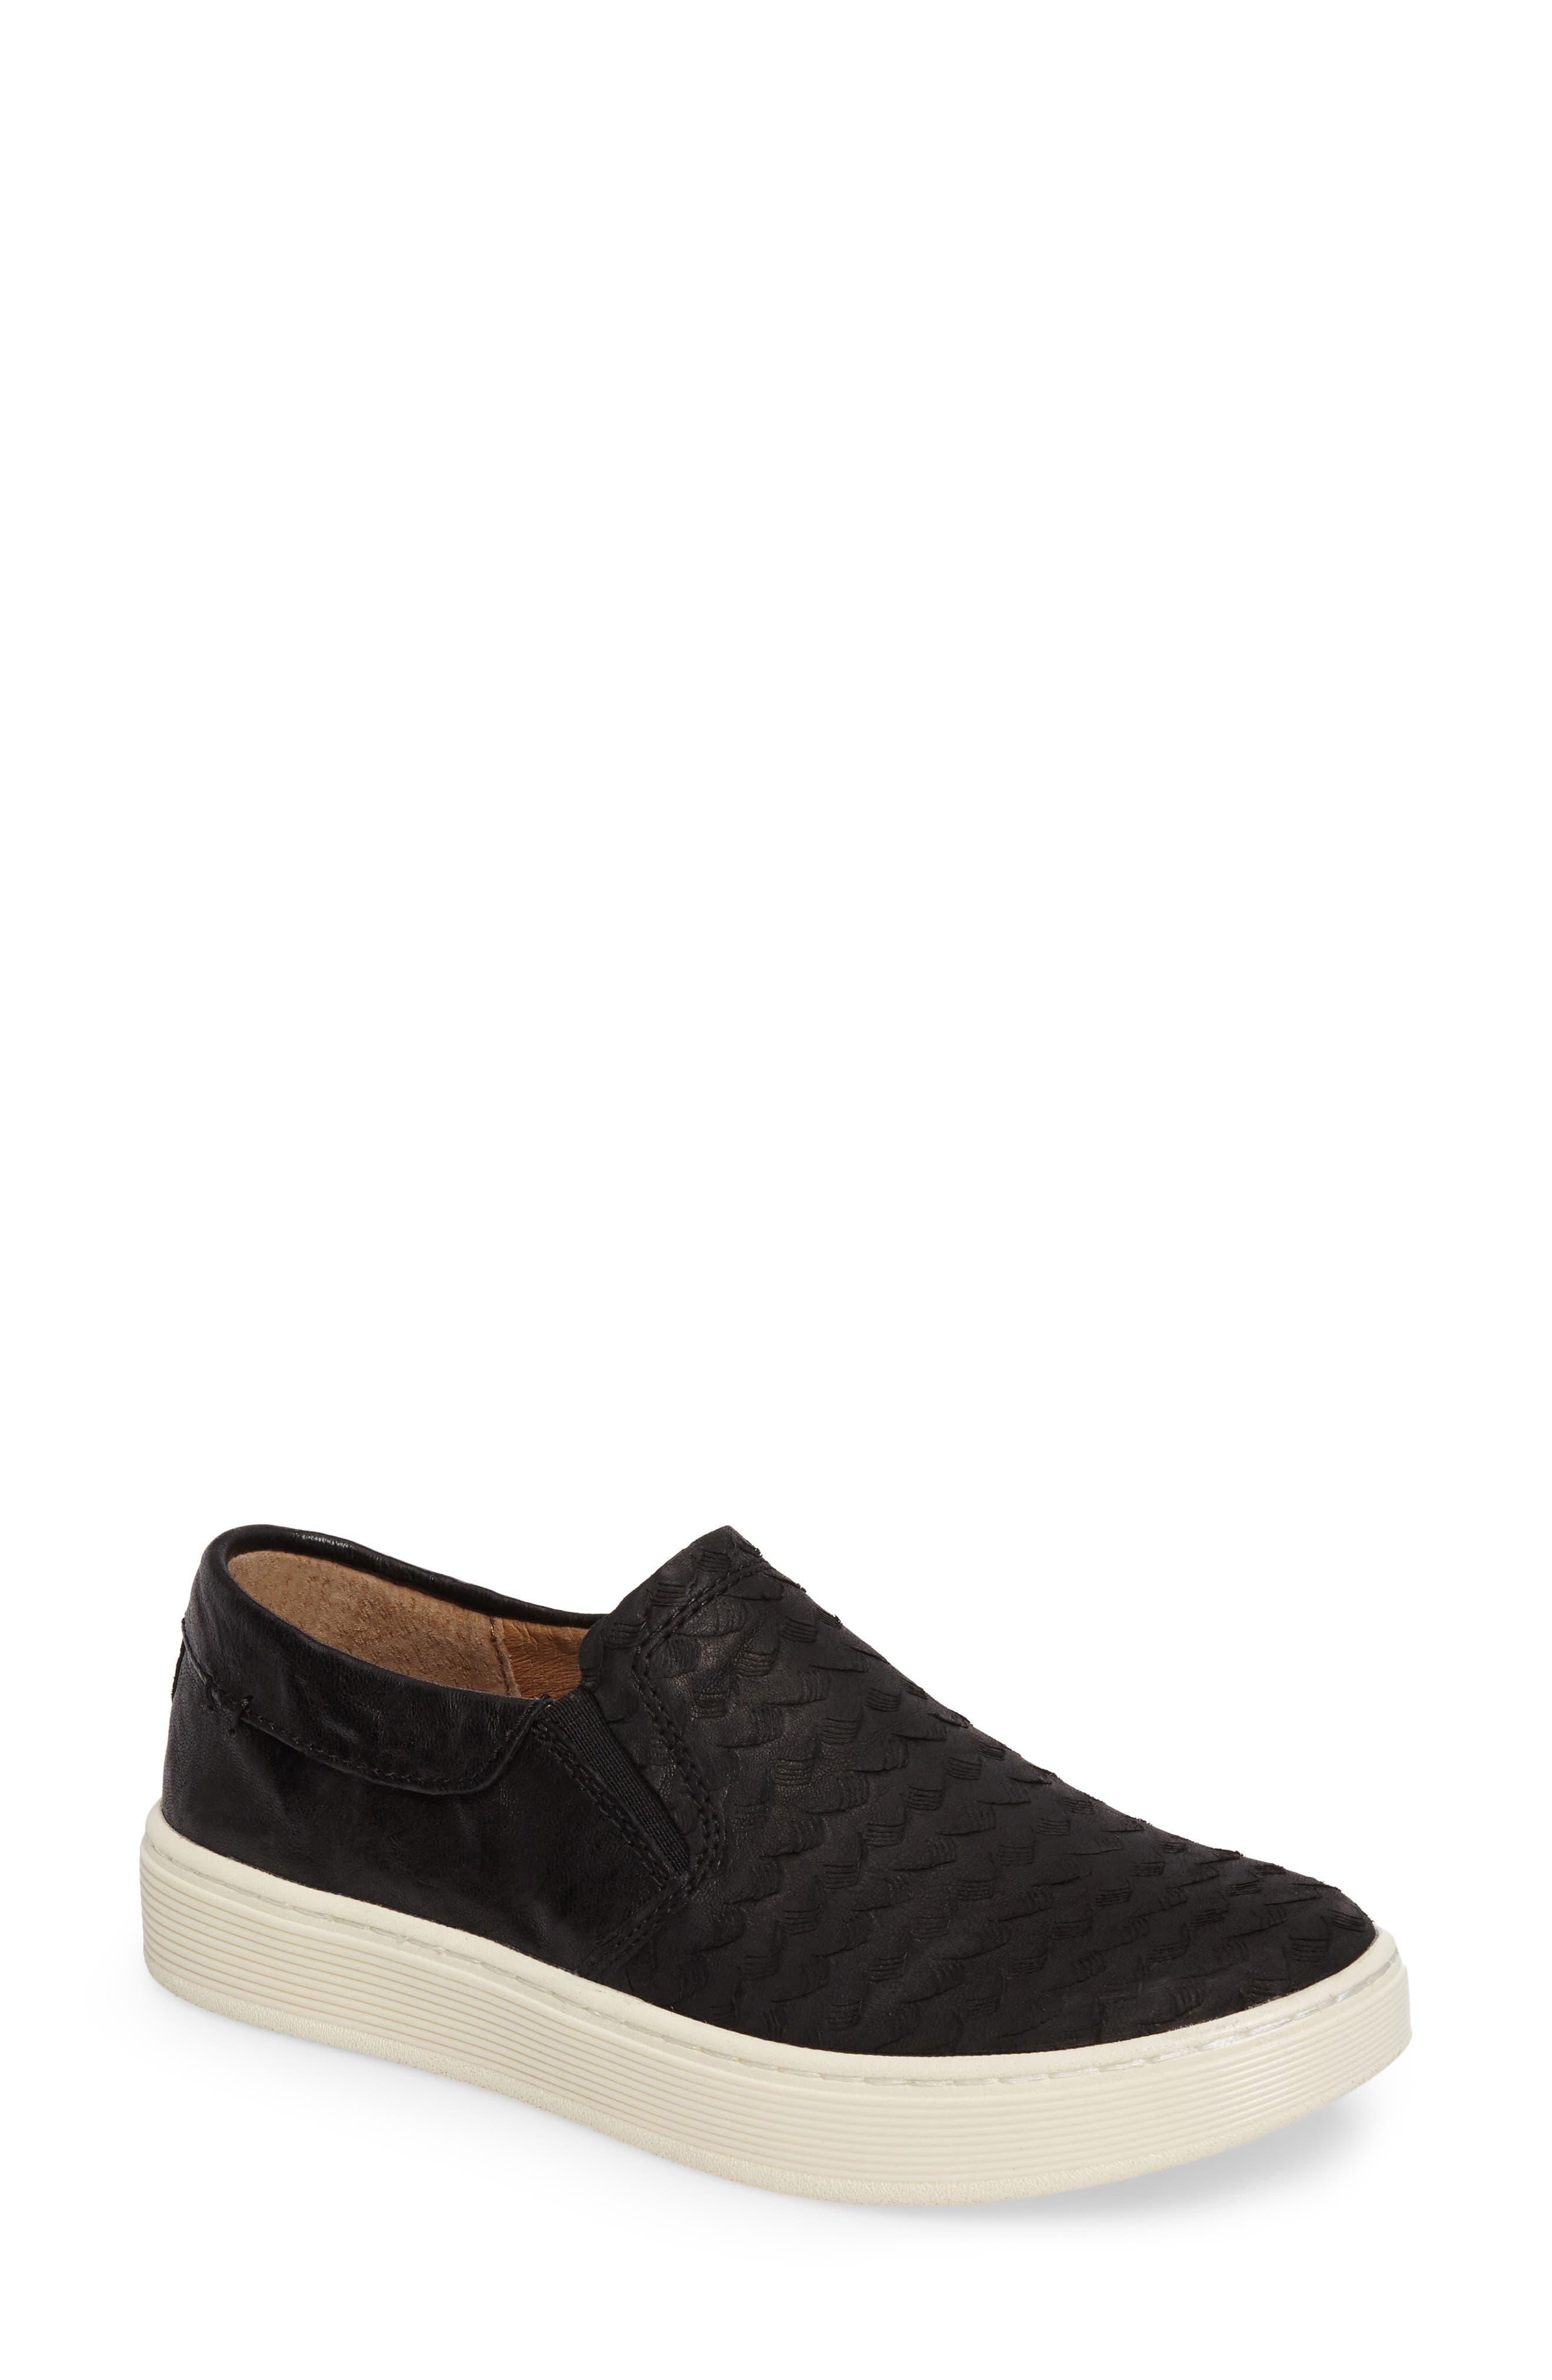 Somers II Slip-on Sneaker,                         Main,                         color, 002